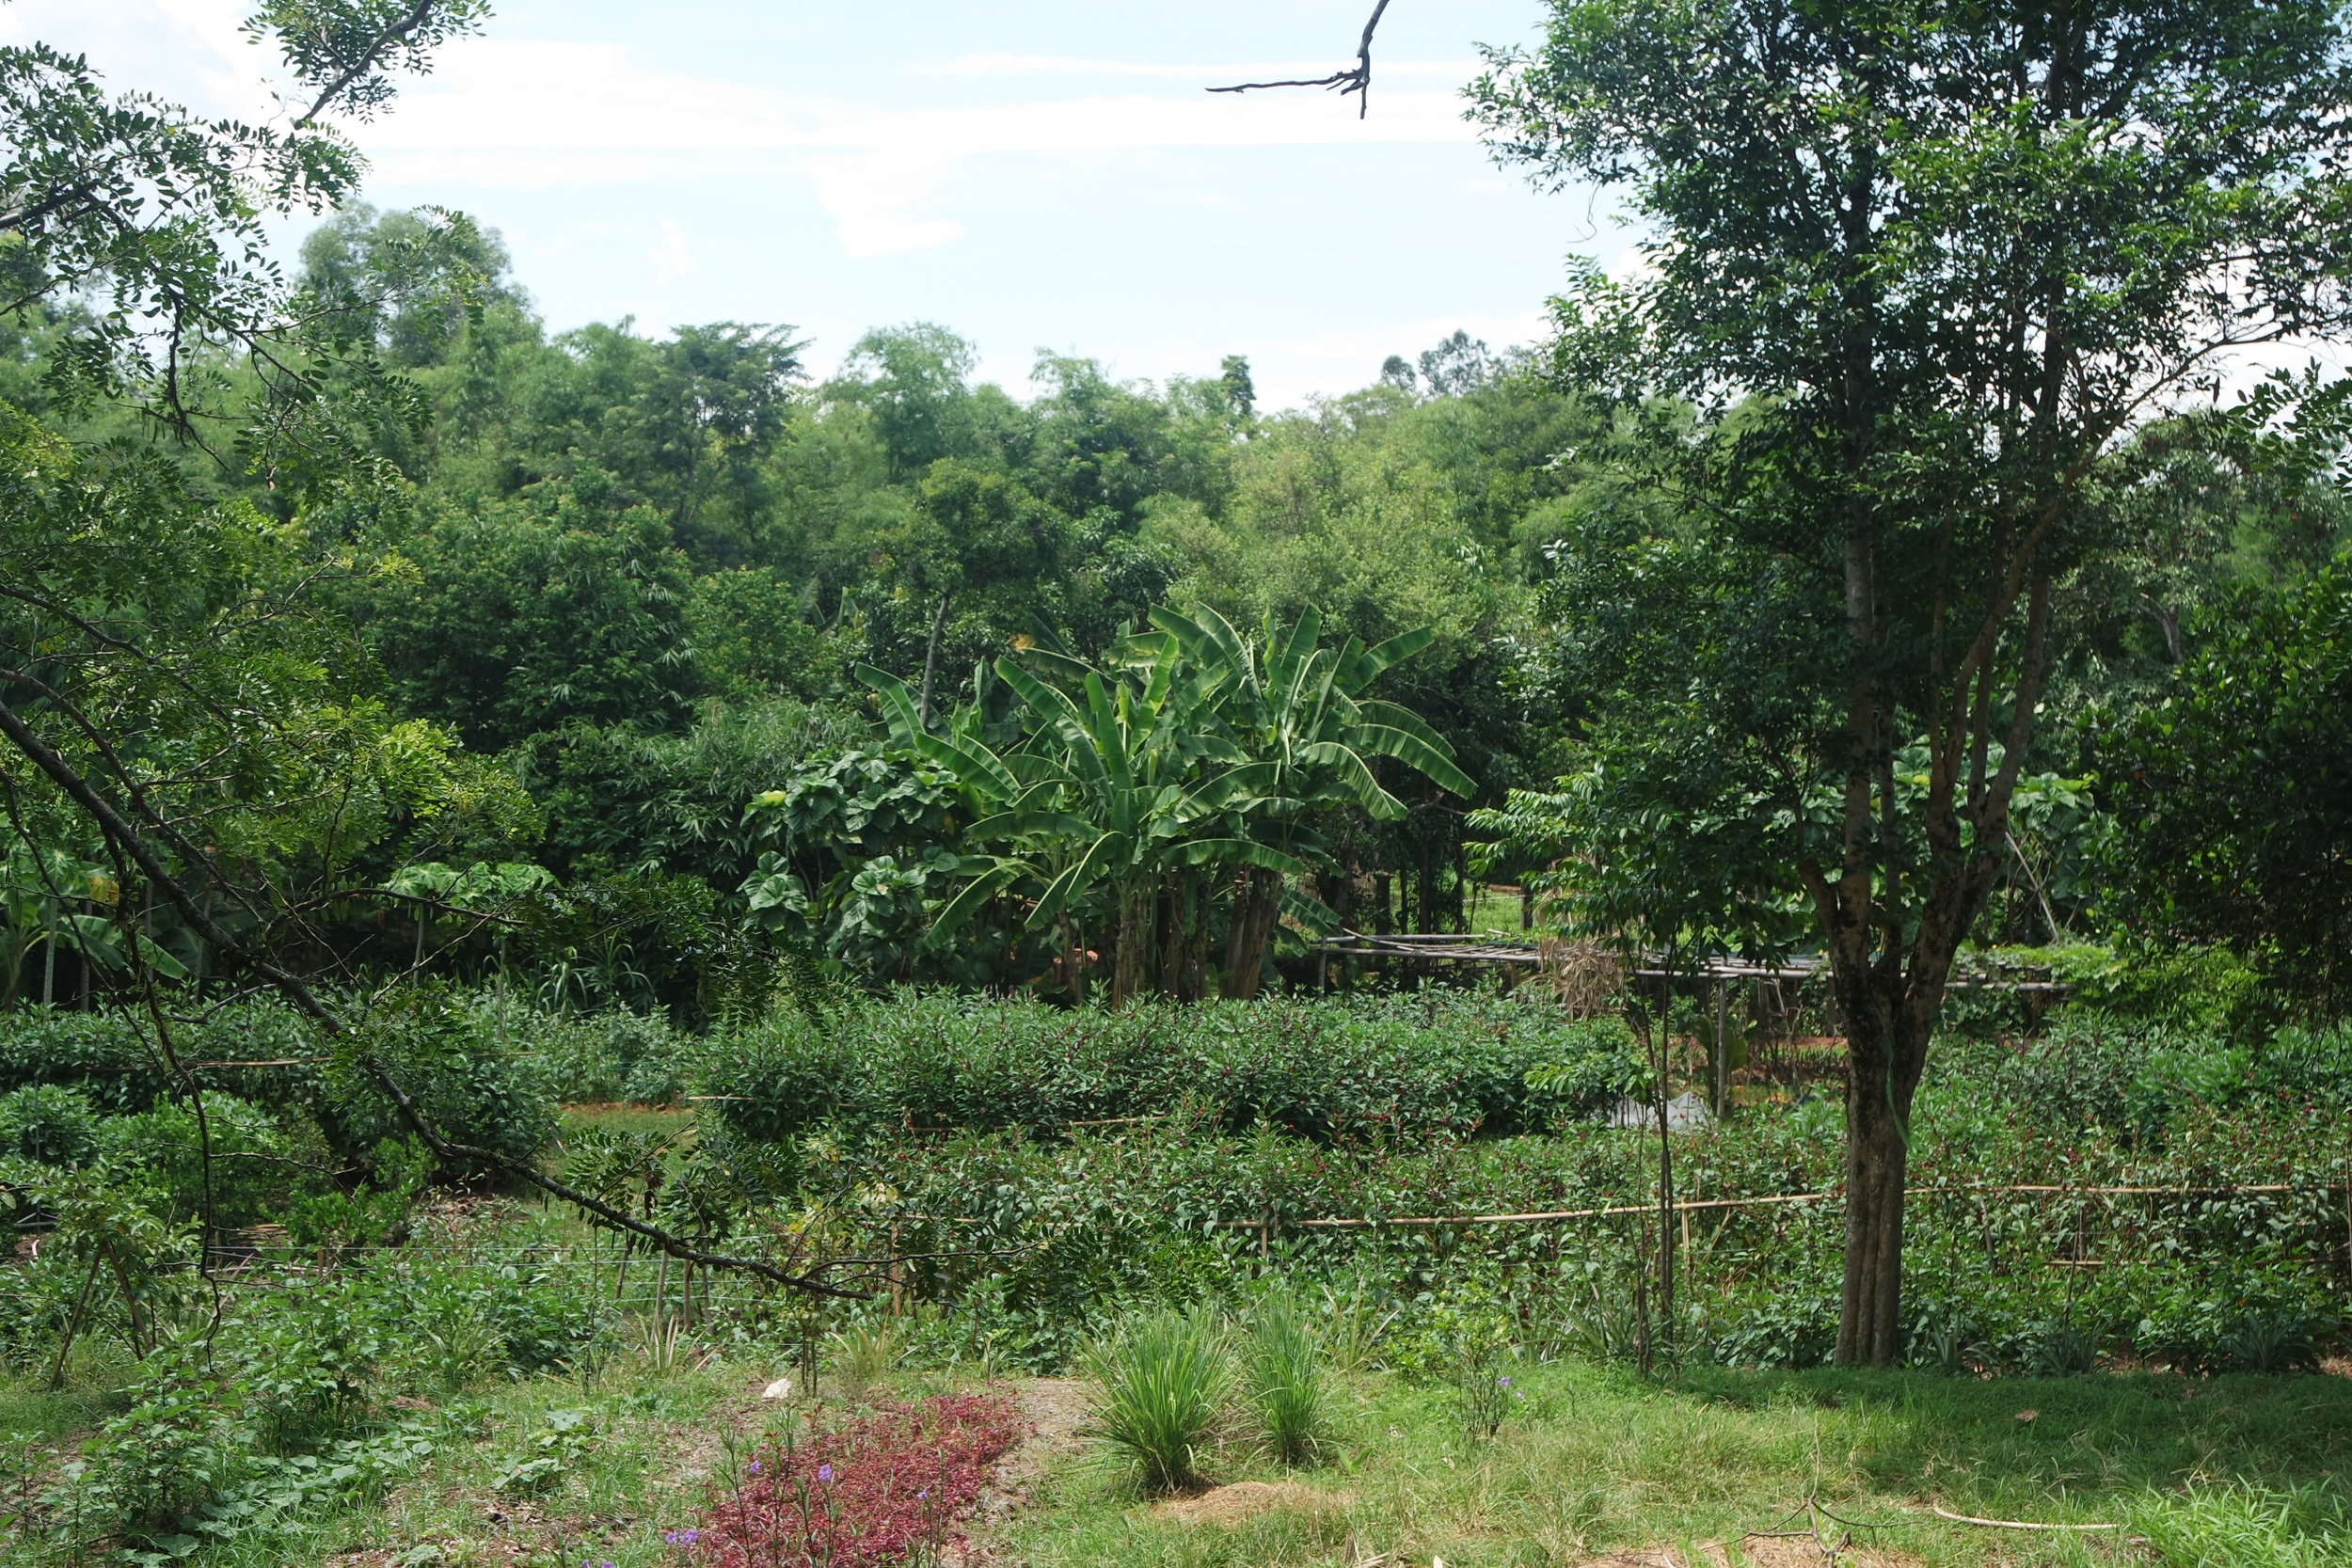 biodynamic garden as main food source of TTG in Hue